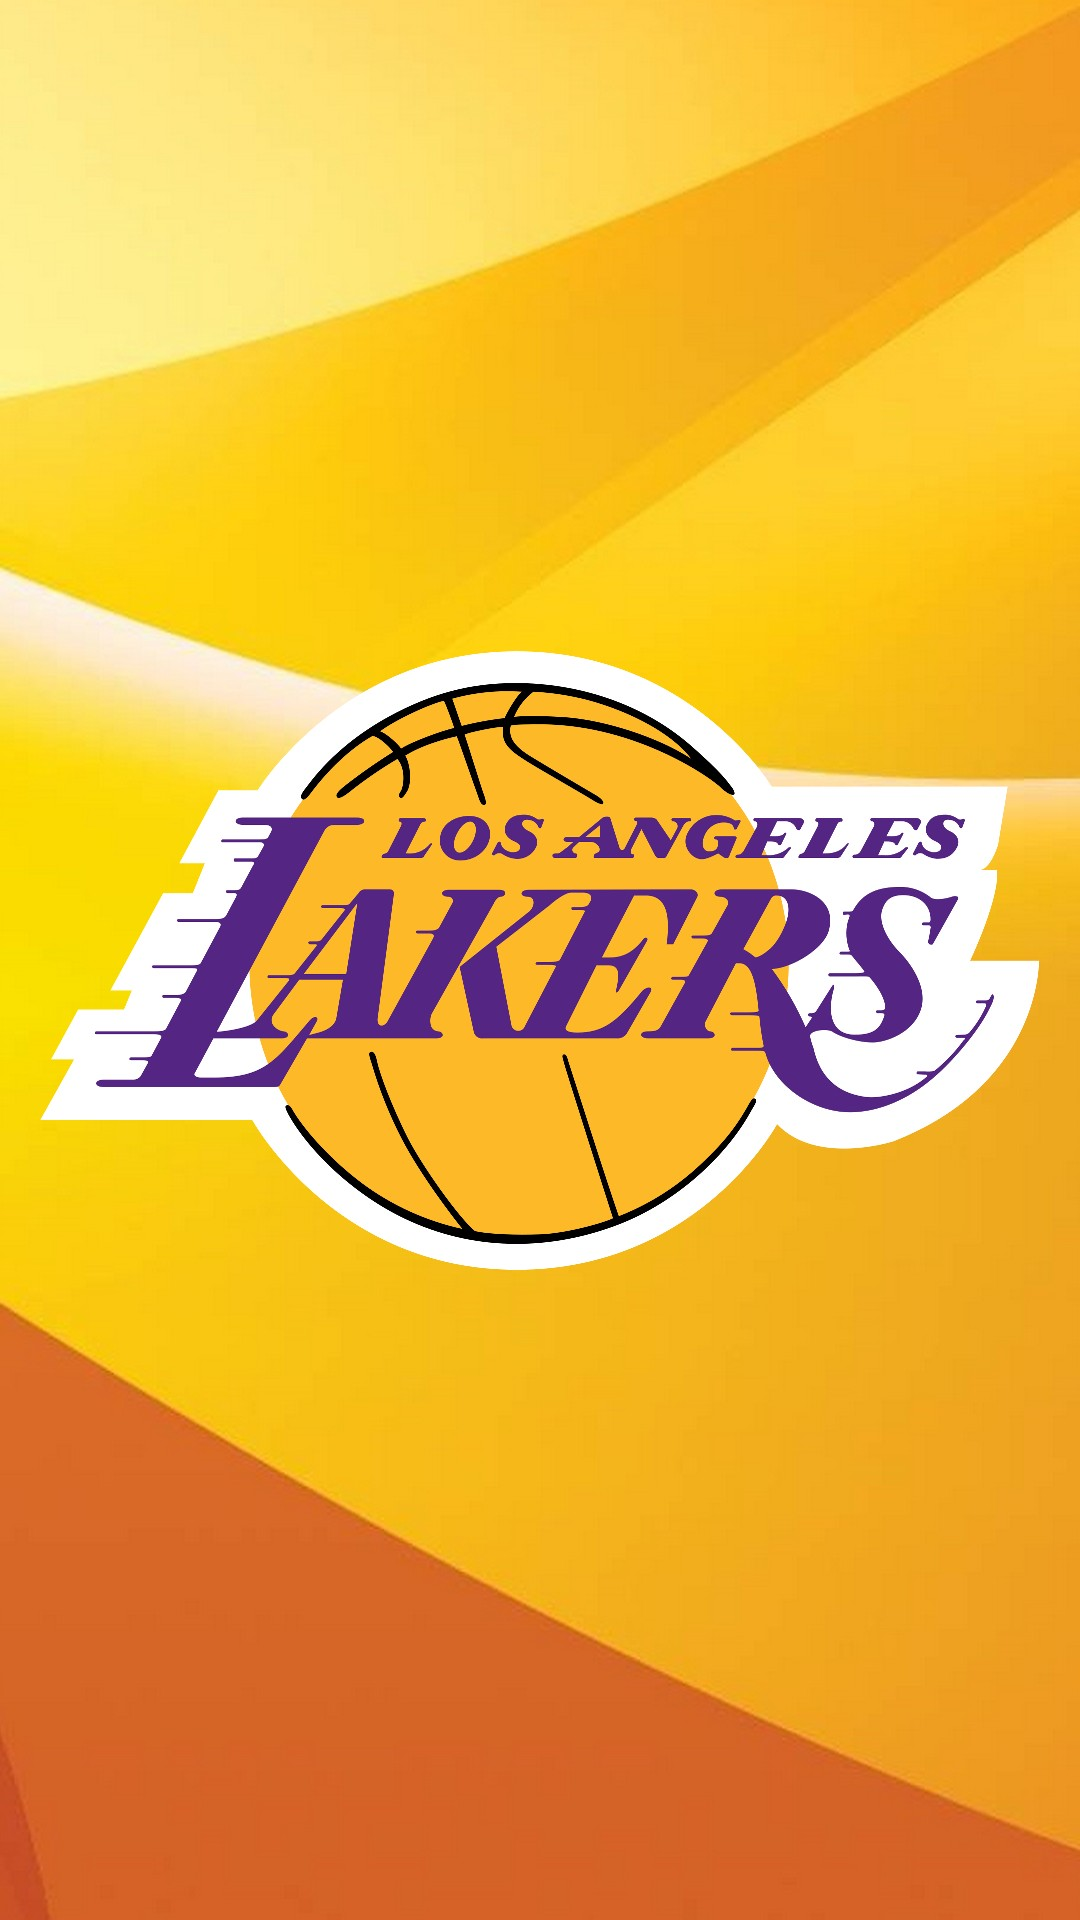 Los Angeles Lakers iPhone Wallpaper   2020 NBA iPhone Wallpaper 1080x1920